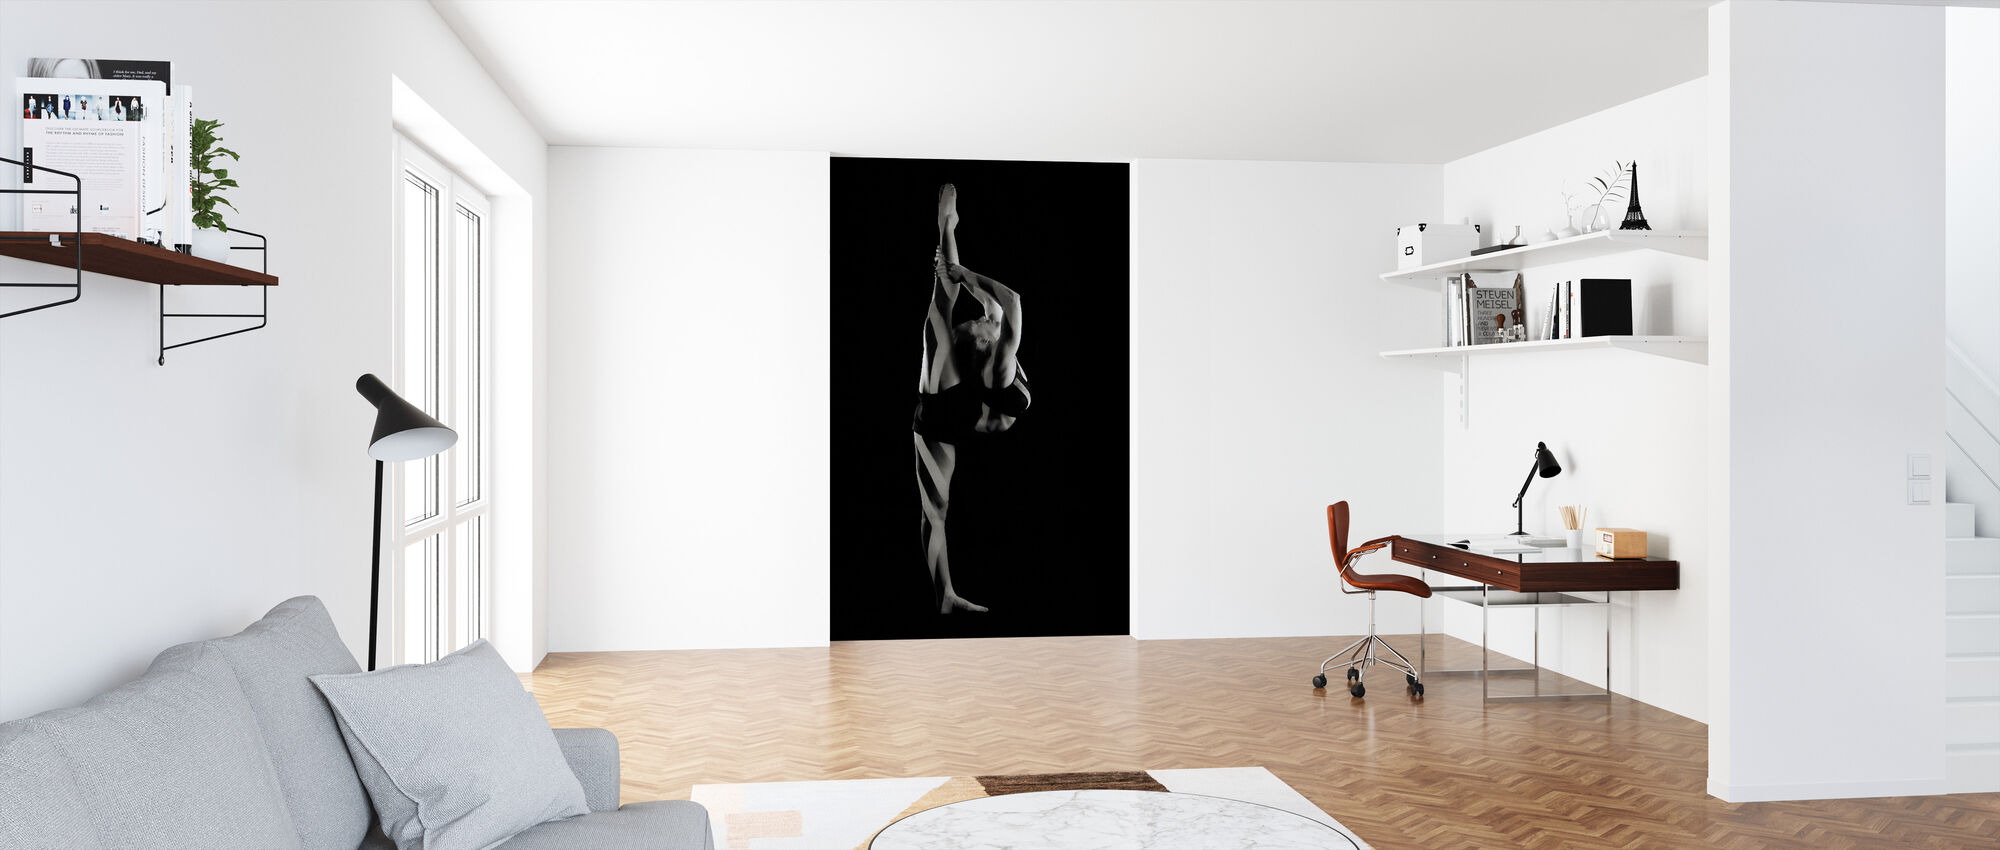 Needle 2 - Wallpaper - Office